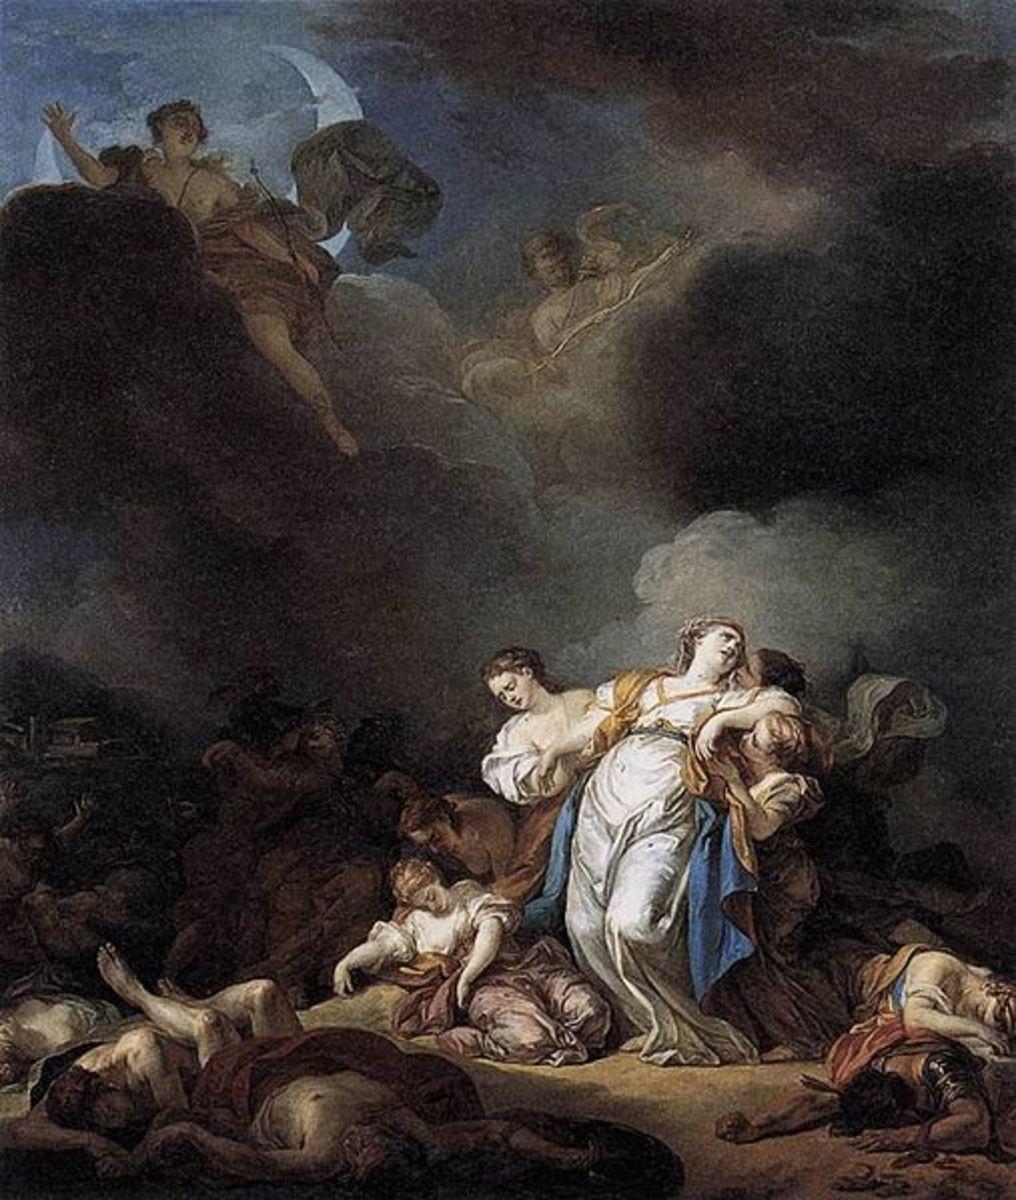 The Children of Niobe - Anicet-Charles-Gabriel Lemonnier (1743–1824)  - PD-art-100